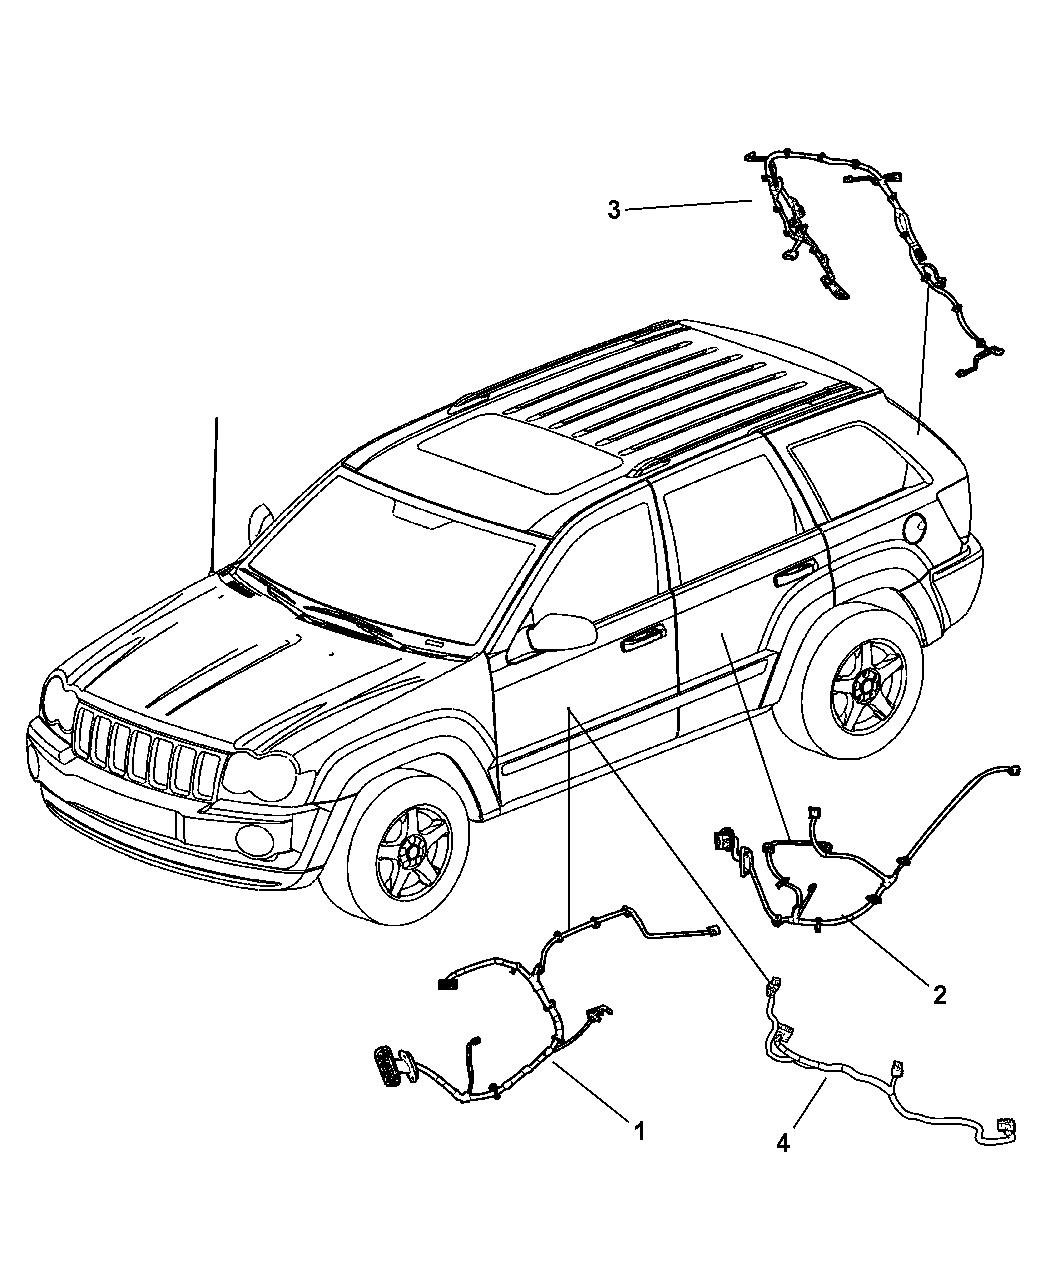 2005 Jeep Grand Cherokee Wiring - Doors & Liftgate